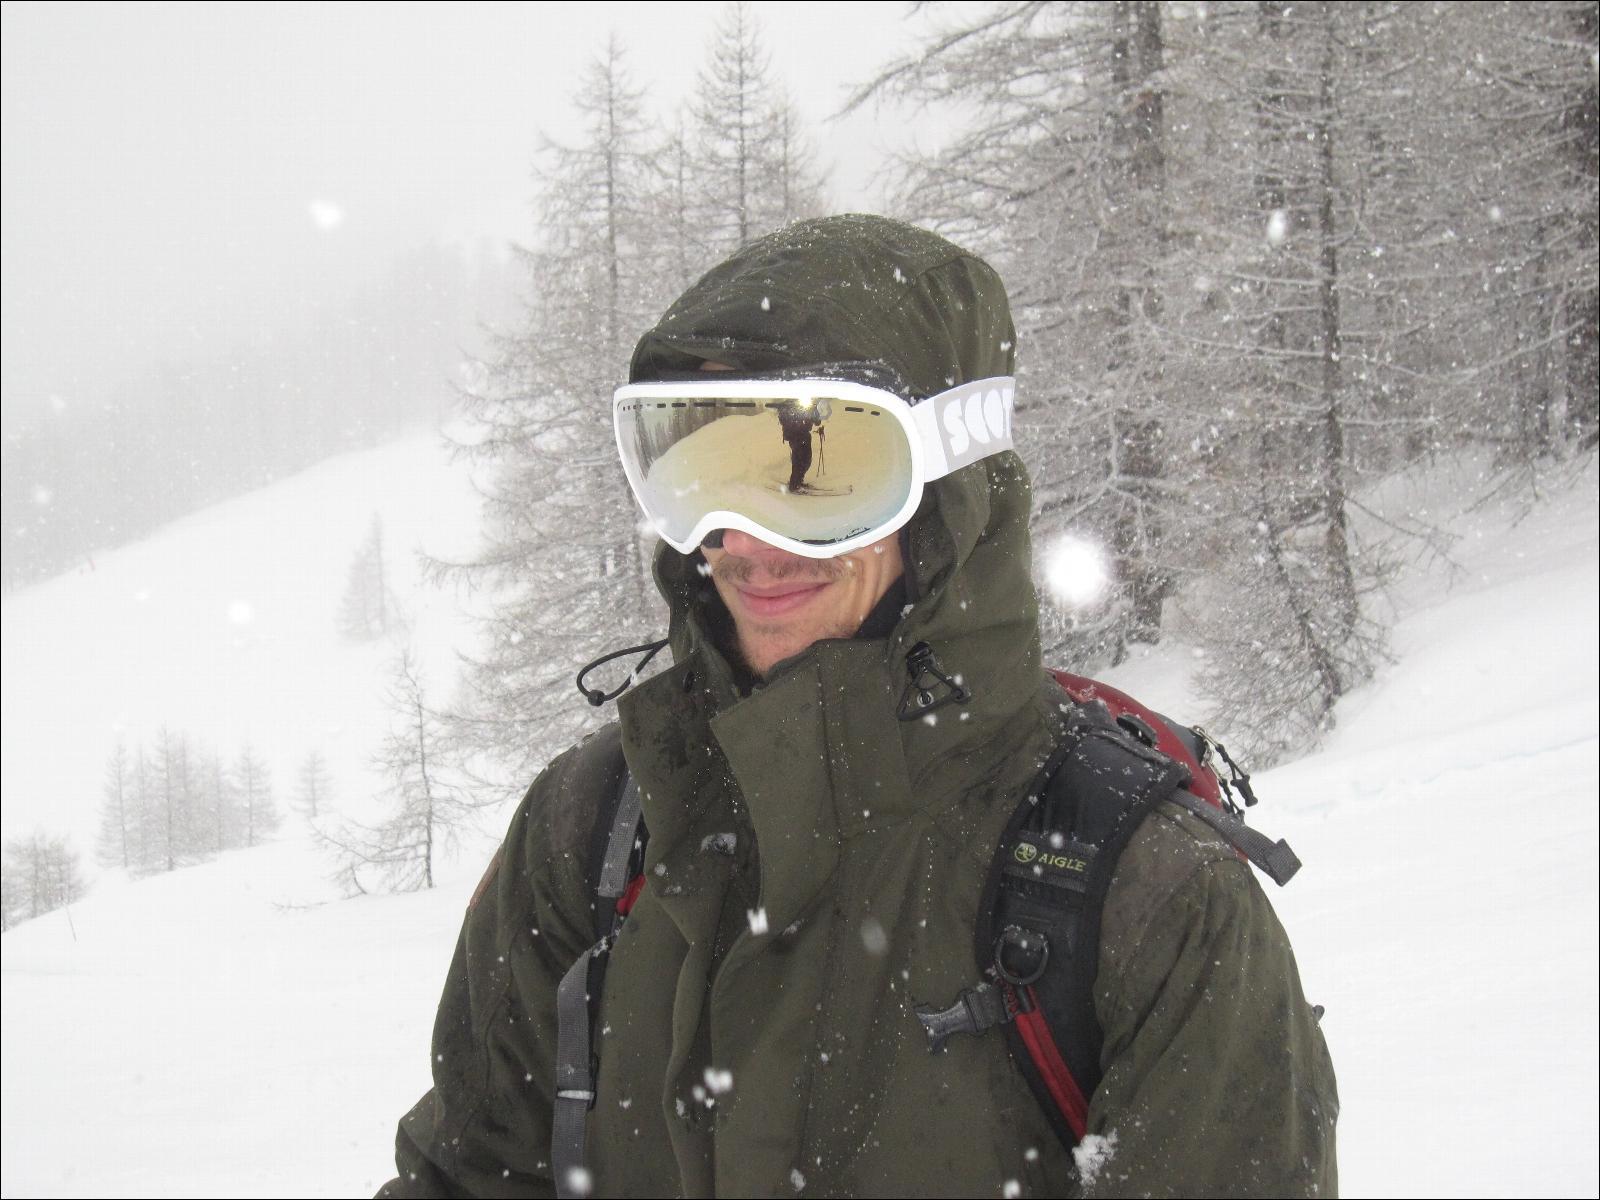 Masque de ski scott off grid white ecran light sensitive for Ecran photochromique